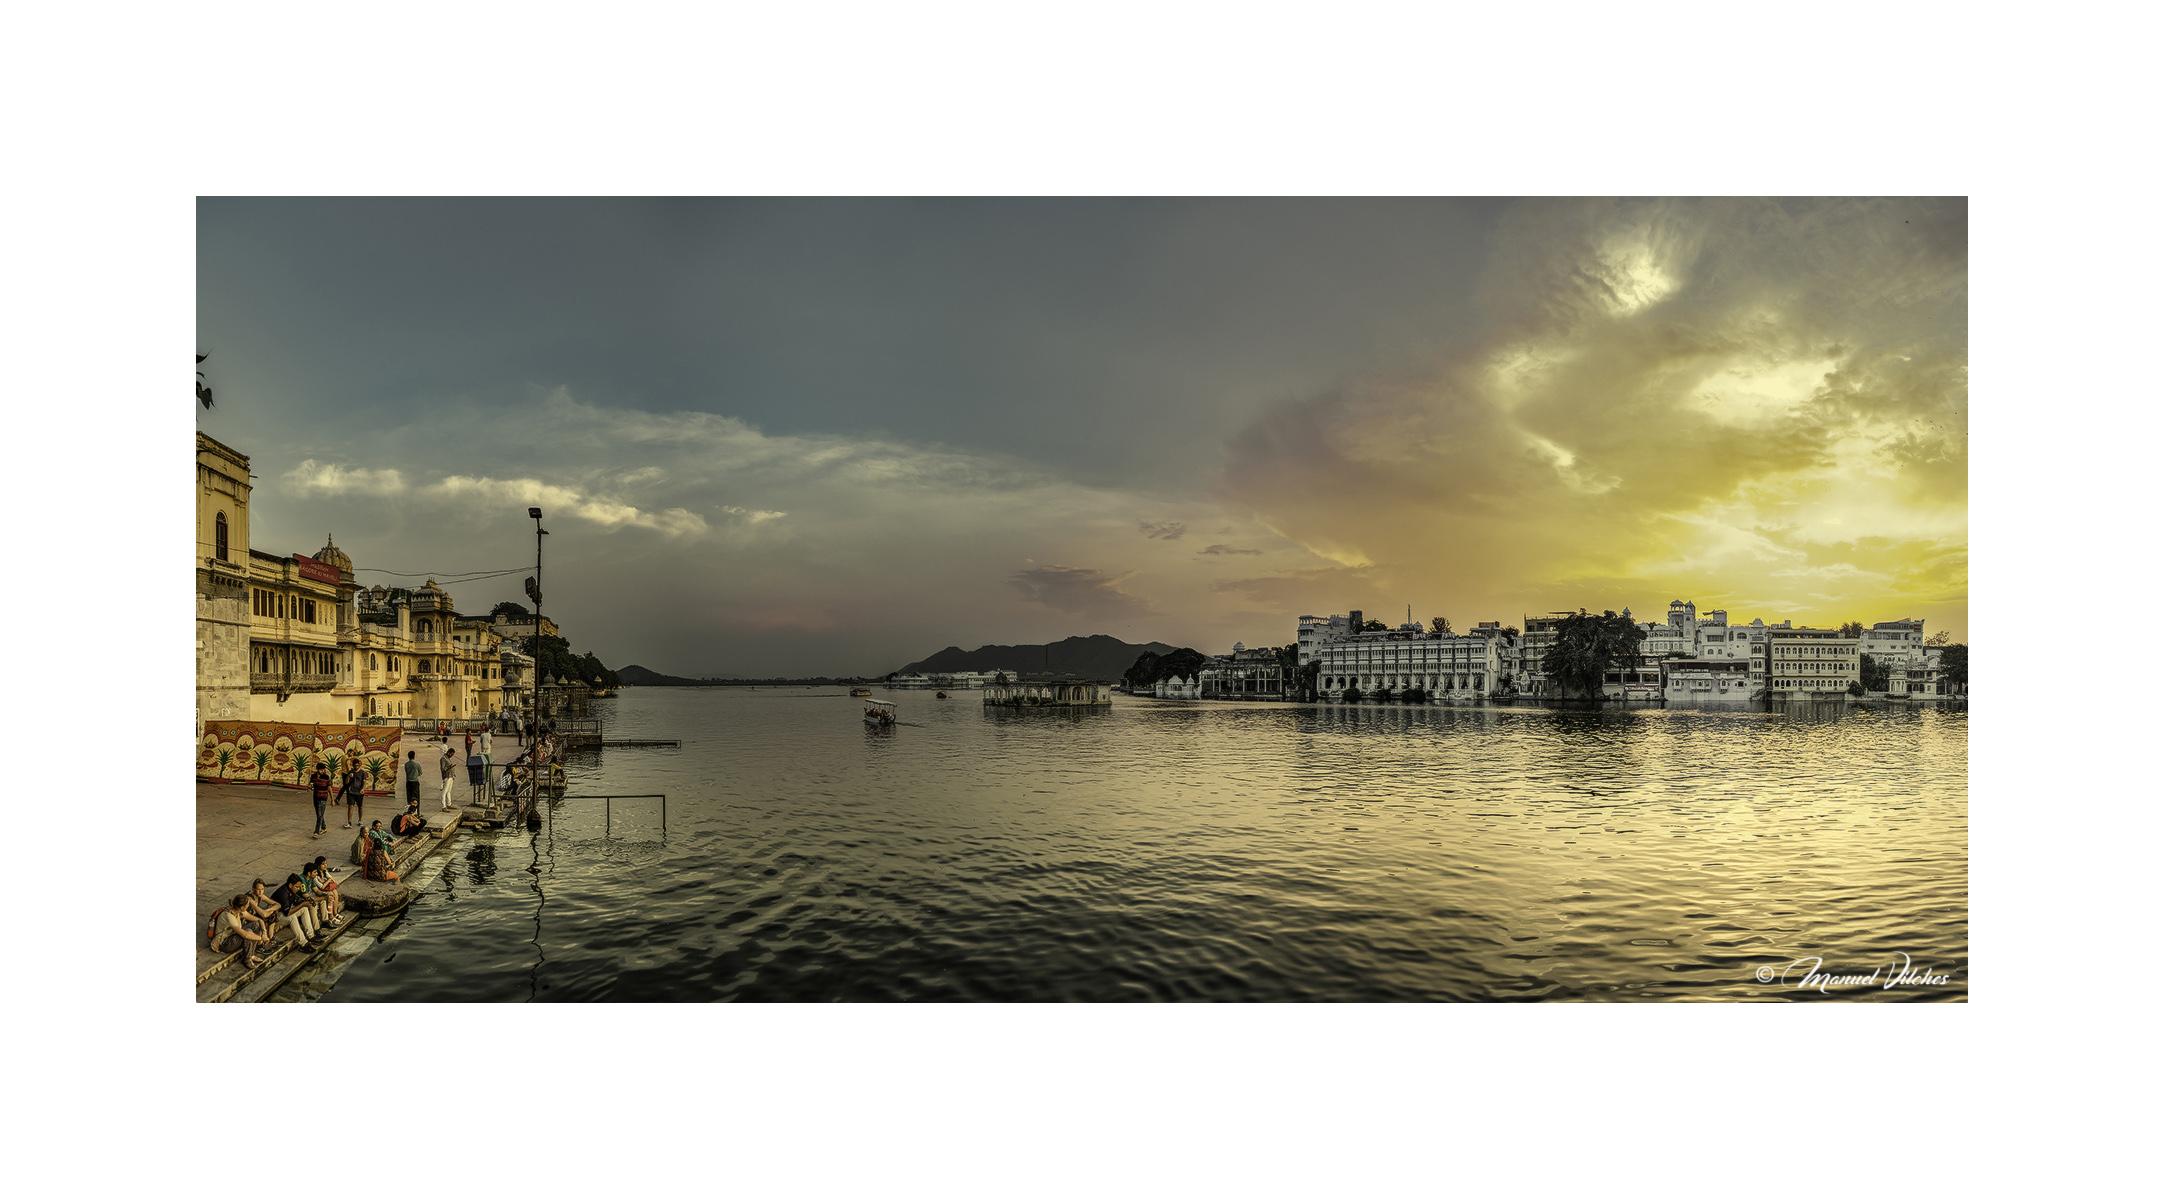 Atardecer en Lago Pichola, Udaipur - Panorámicas de India - MVilches , Fotográfia